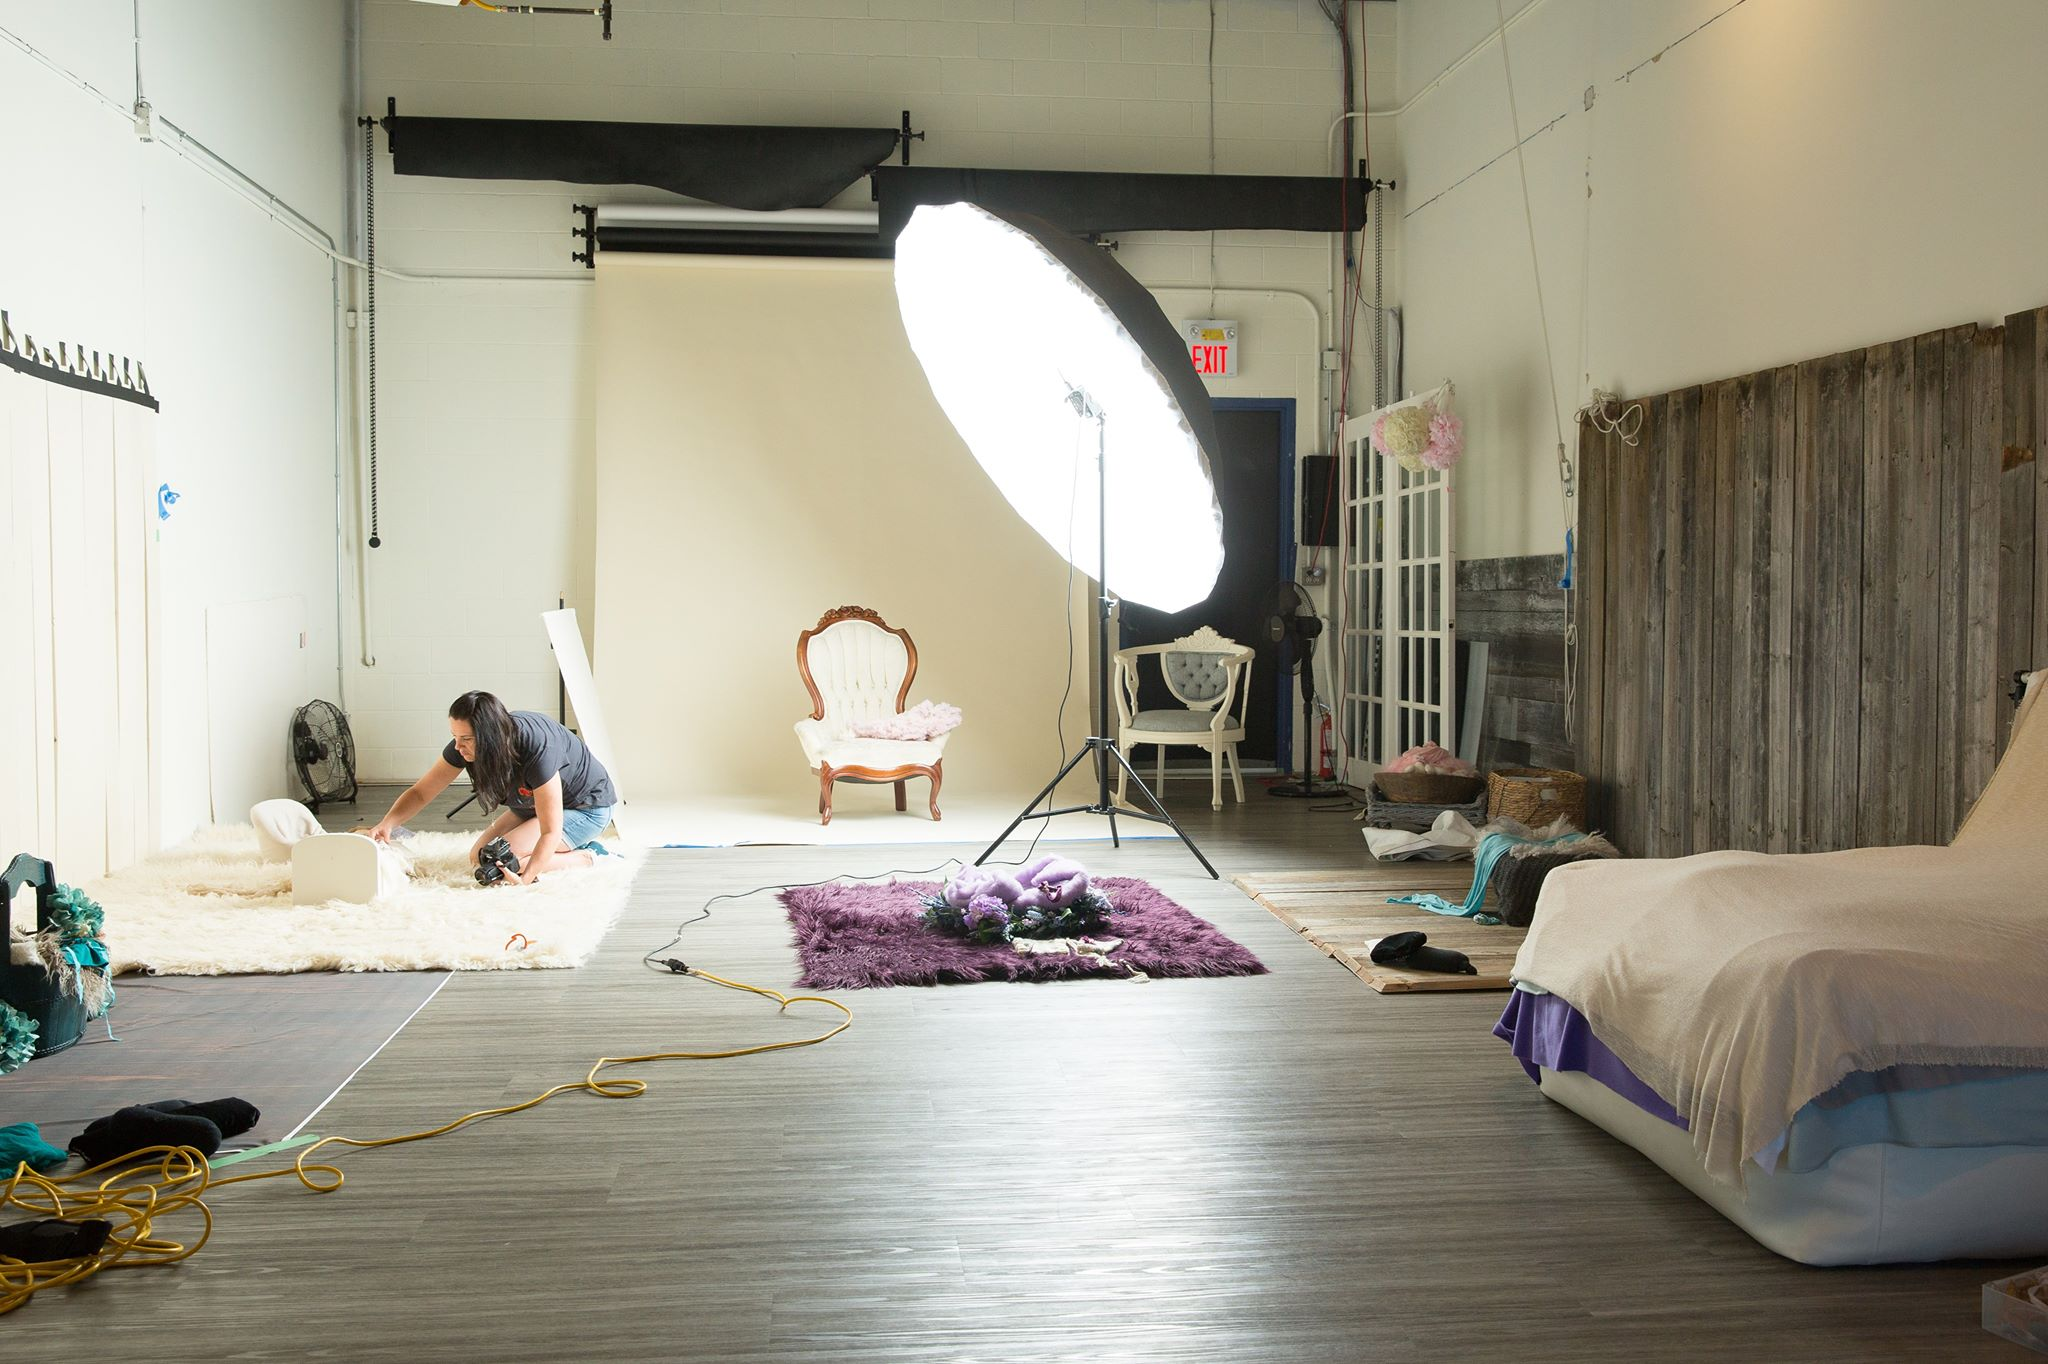 new studio anniversary, gemini visuals photography new studio space, south surrey photographer